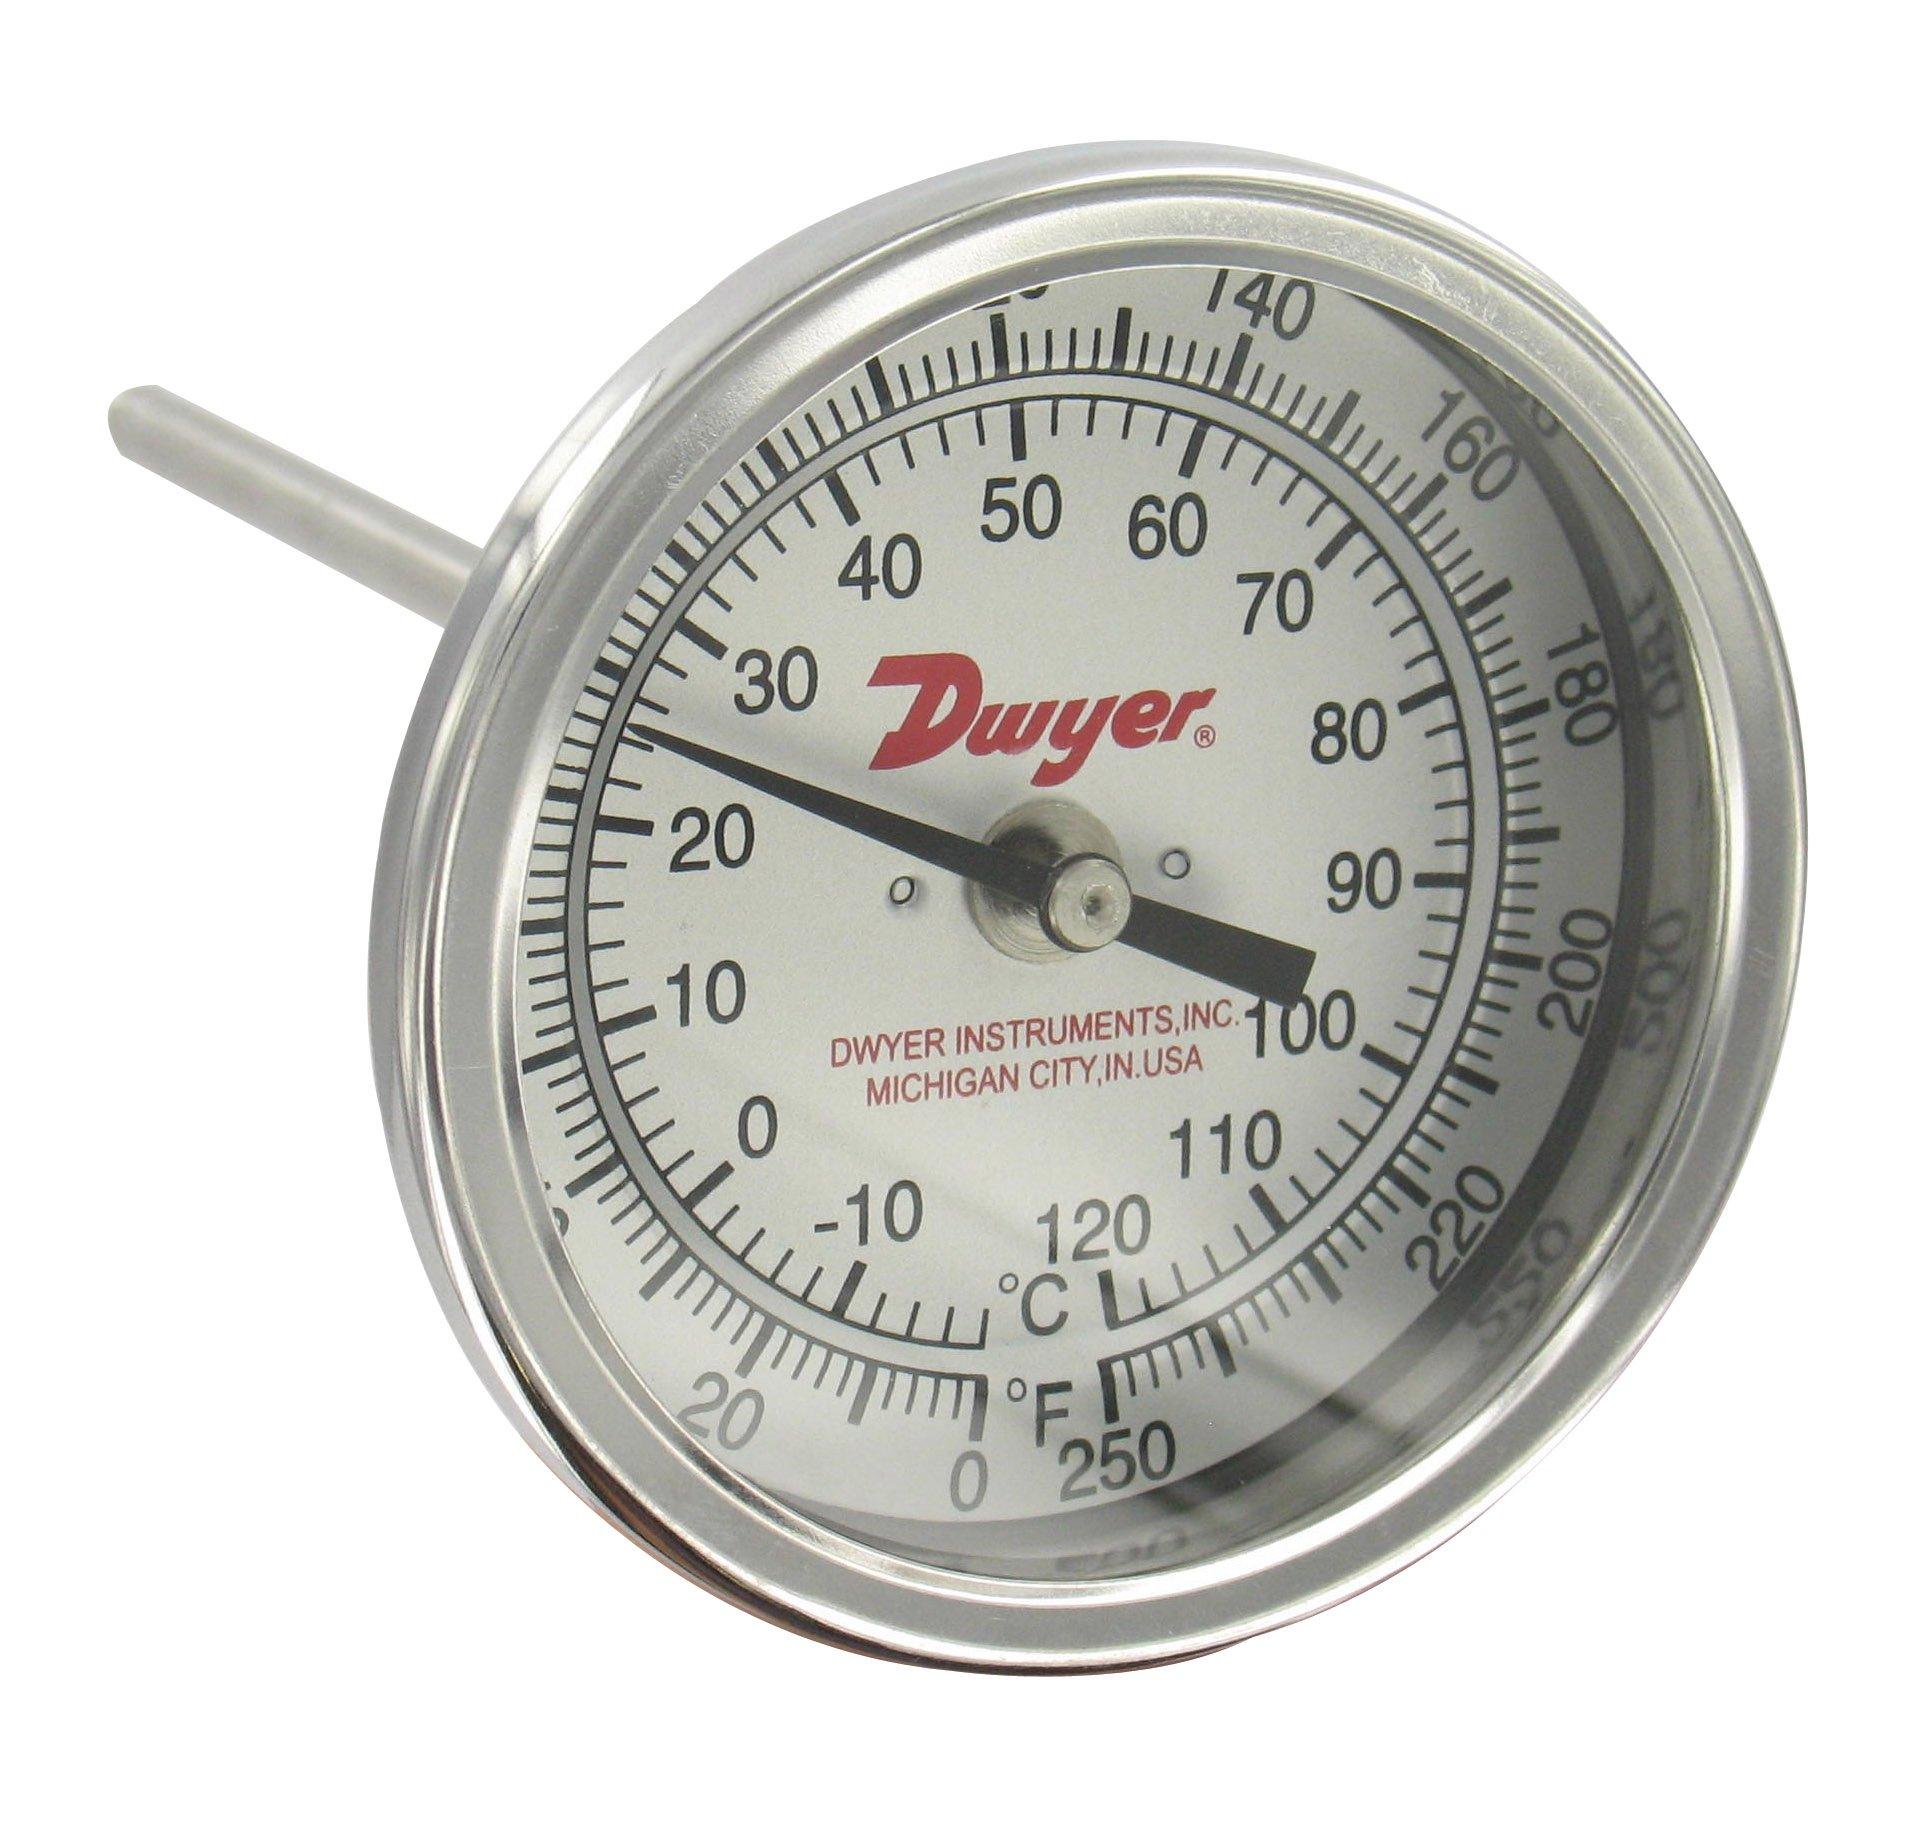 Dwyer Bimetal Thermometer, BTB2405D, 0-250°F (-20-120°C), 2'' Dial, 4'' Stem, Back Connection